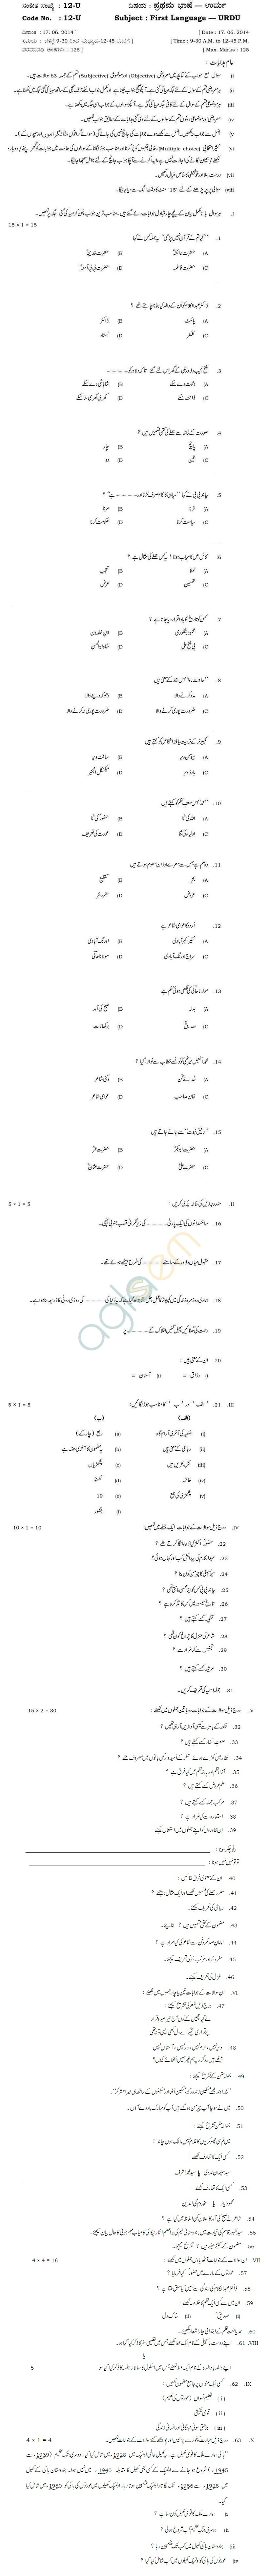 Karnataka SSLC Solved Question Paper June 2014 - Urdu